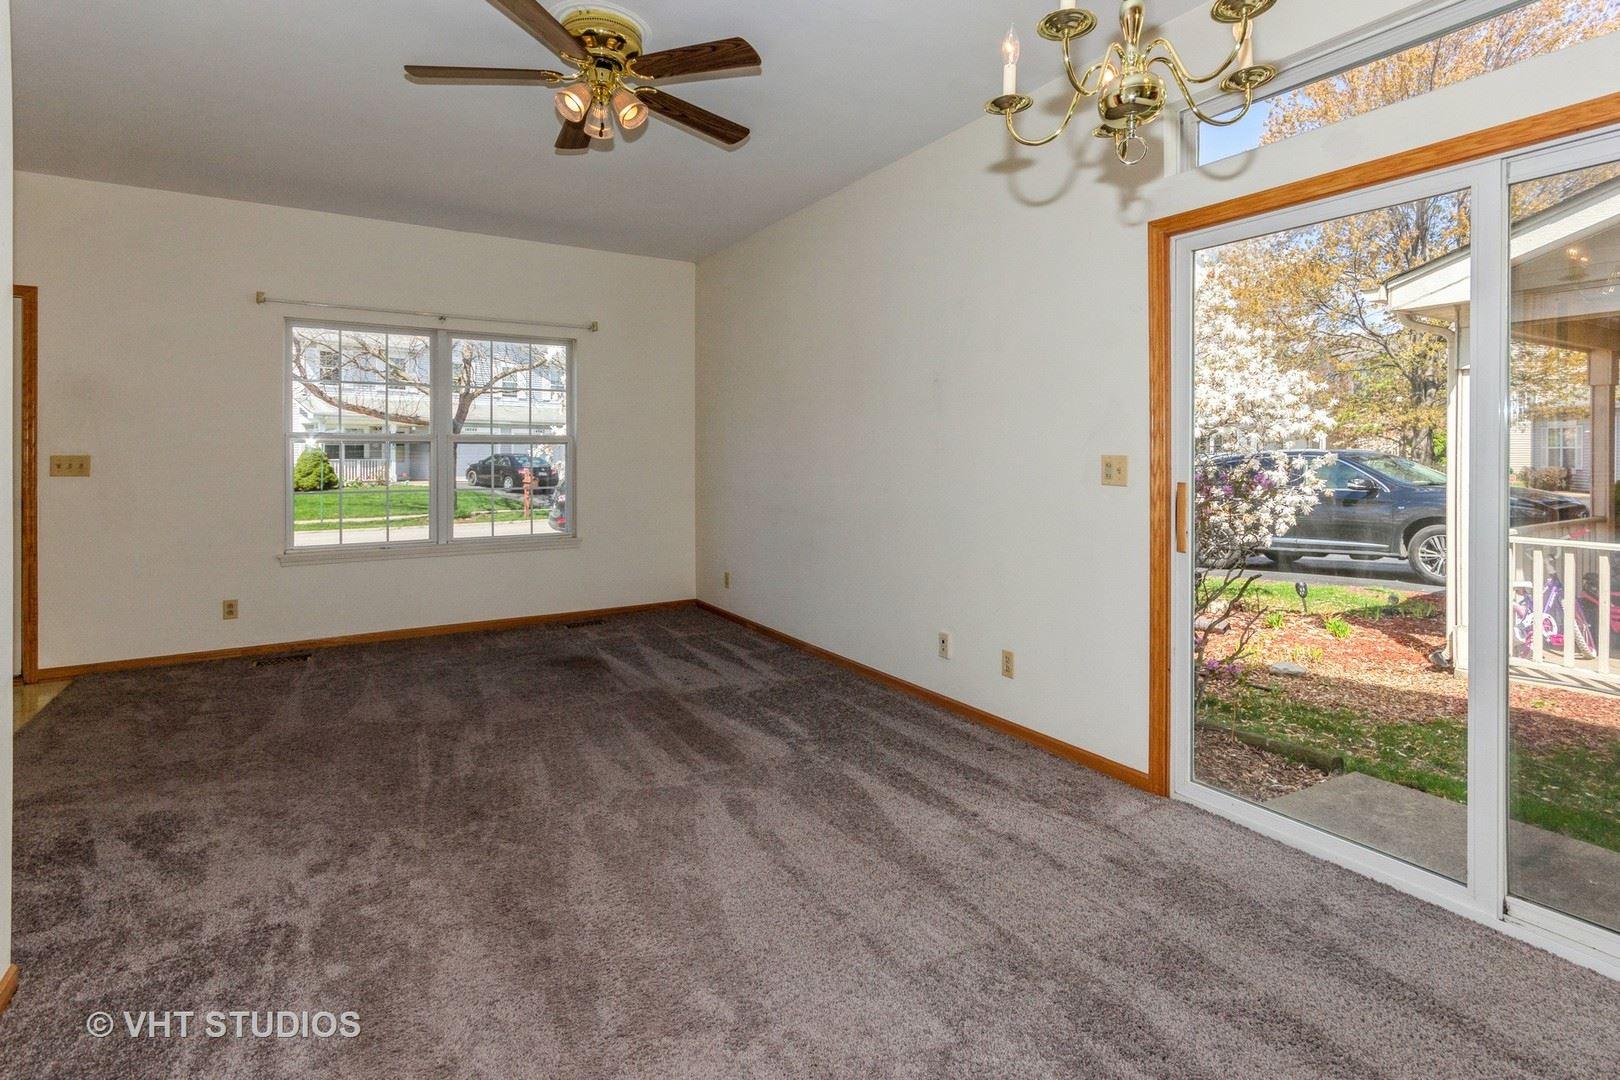 Photo of 14047 Danbury Drive, Plainfield, IL 60544 (MLS # 11054976)